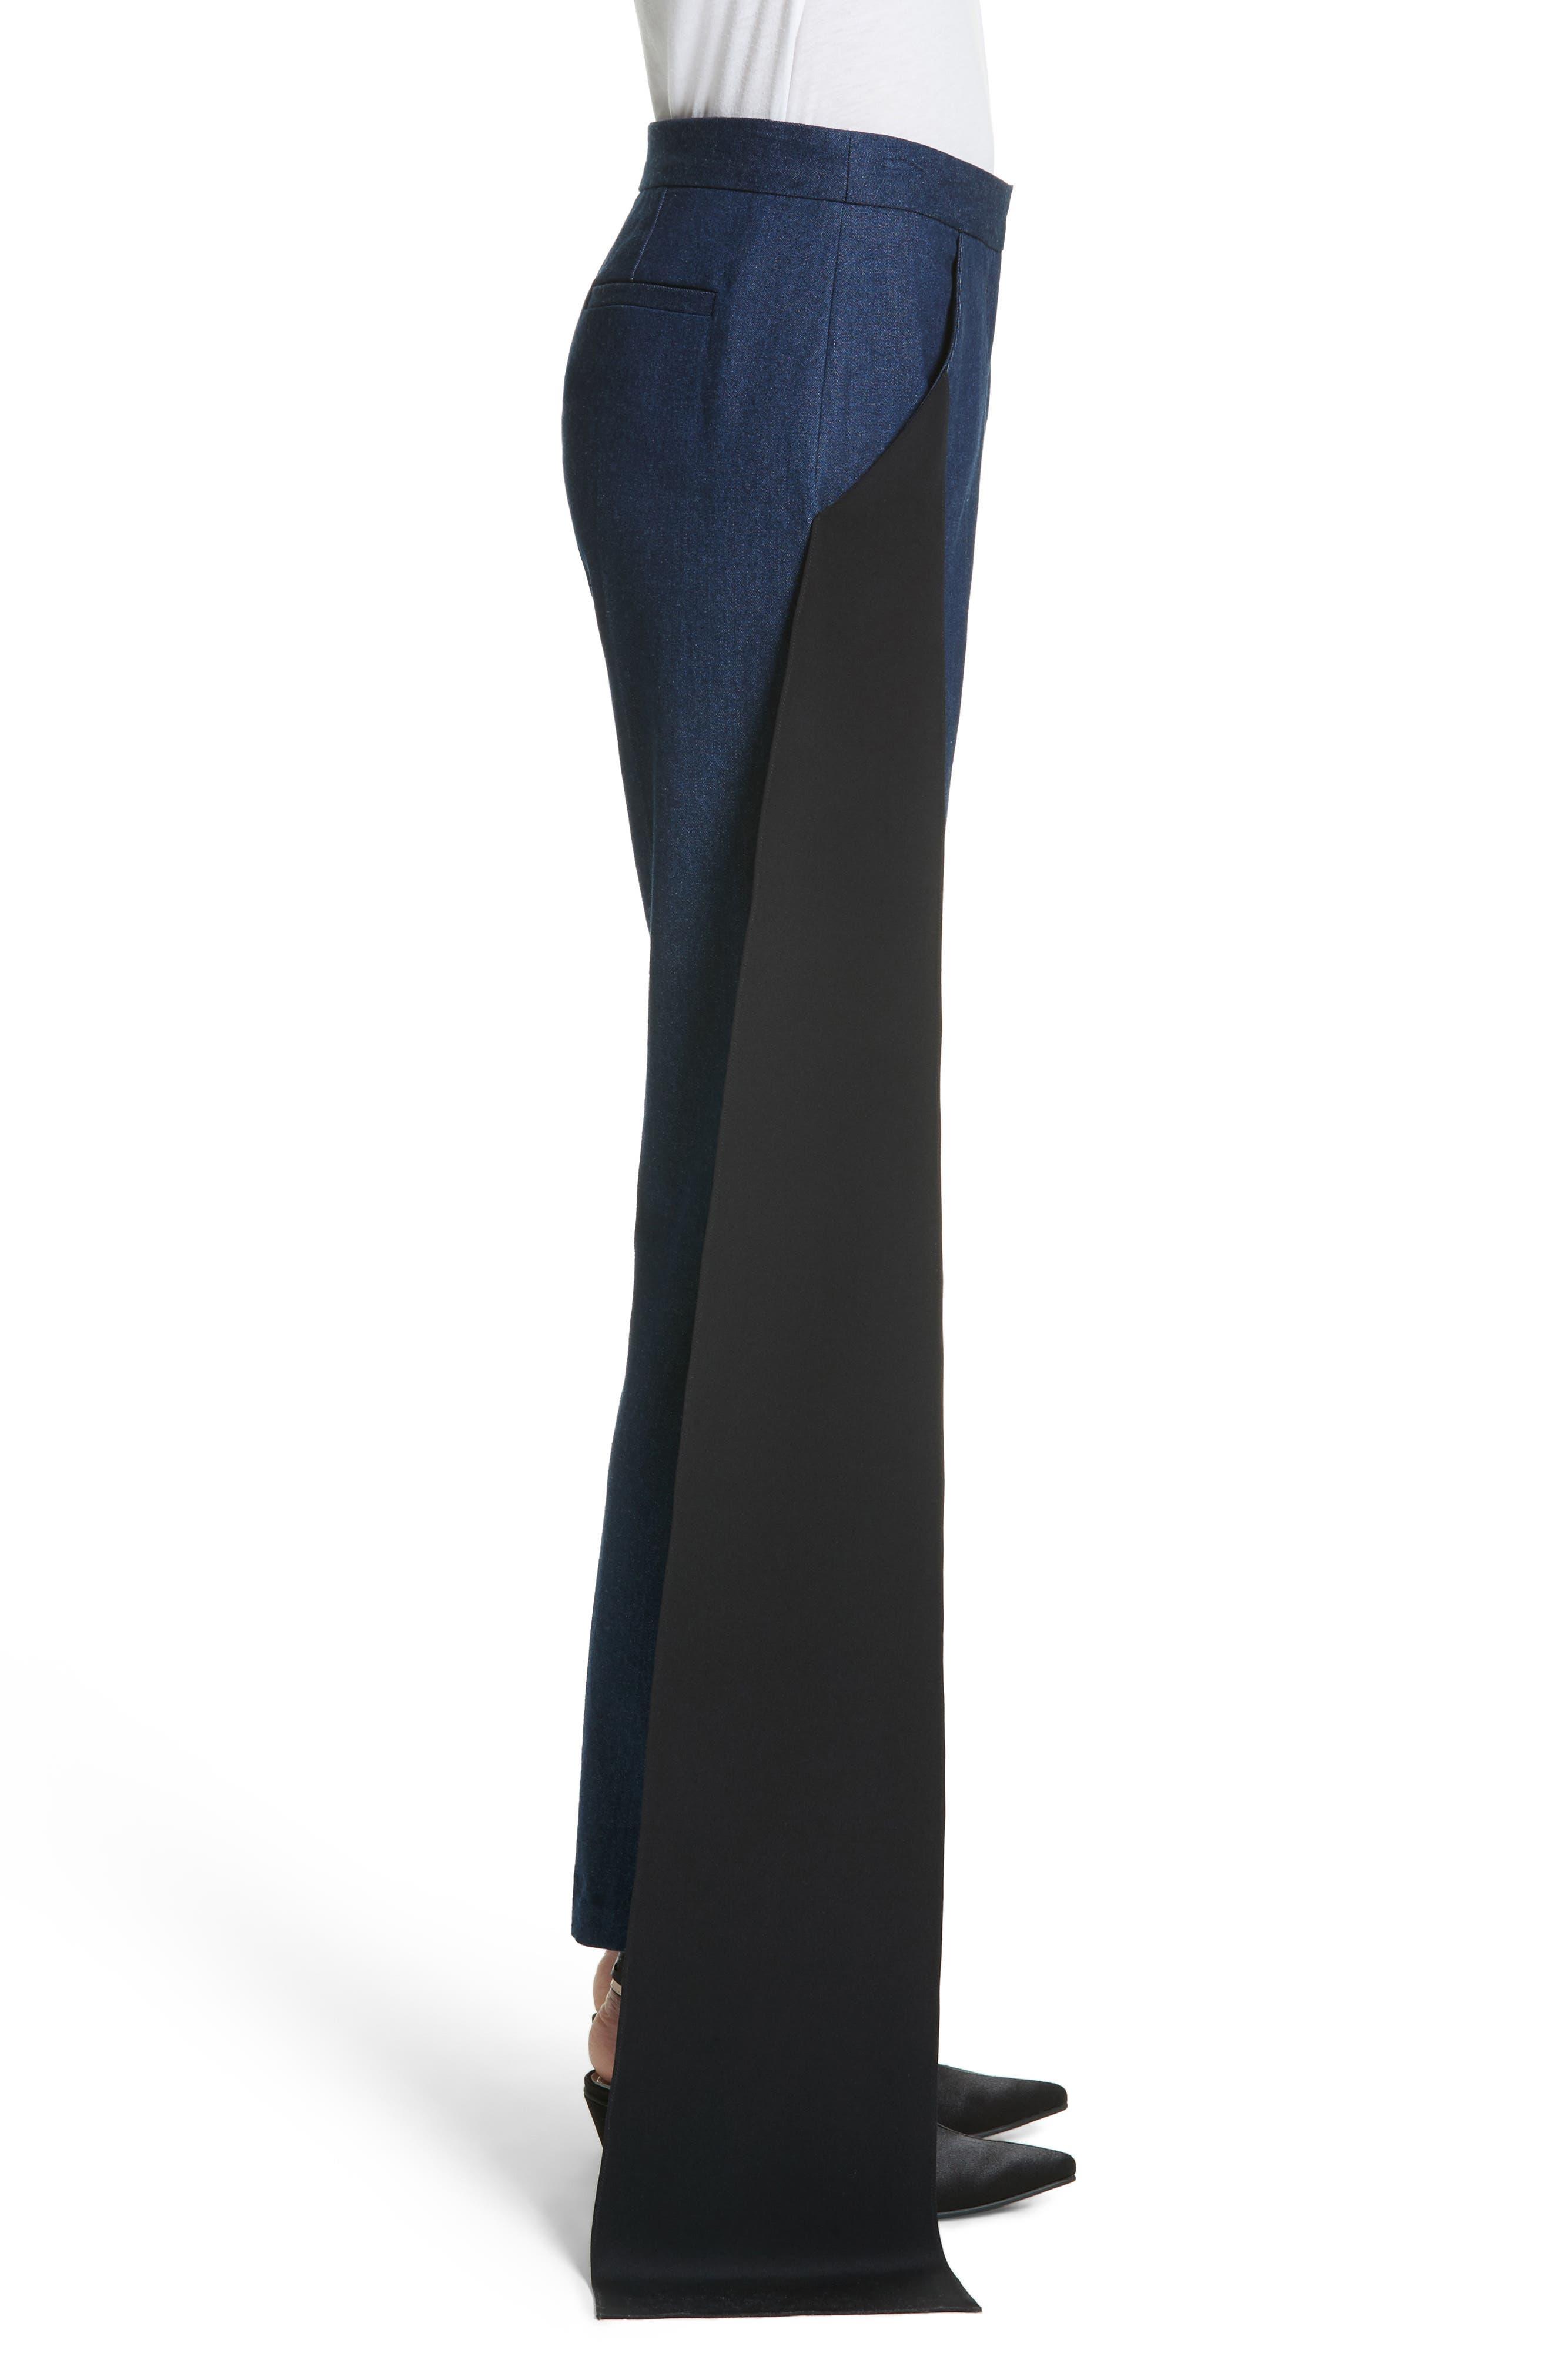 Mojave Side Panel Skinny Jeans,                             Alternate thumbnail 4, color,                             Dark Wash Denim